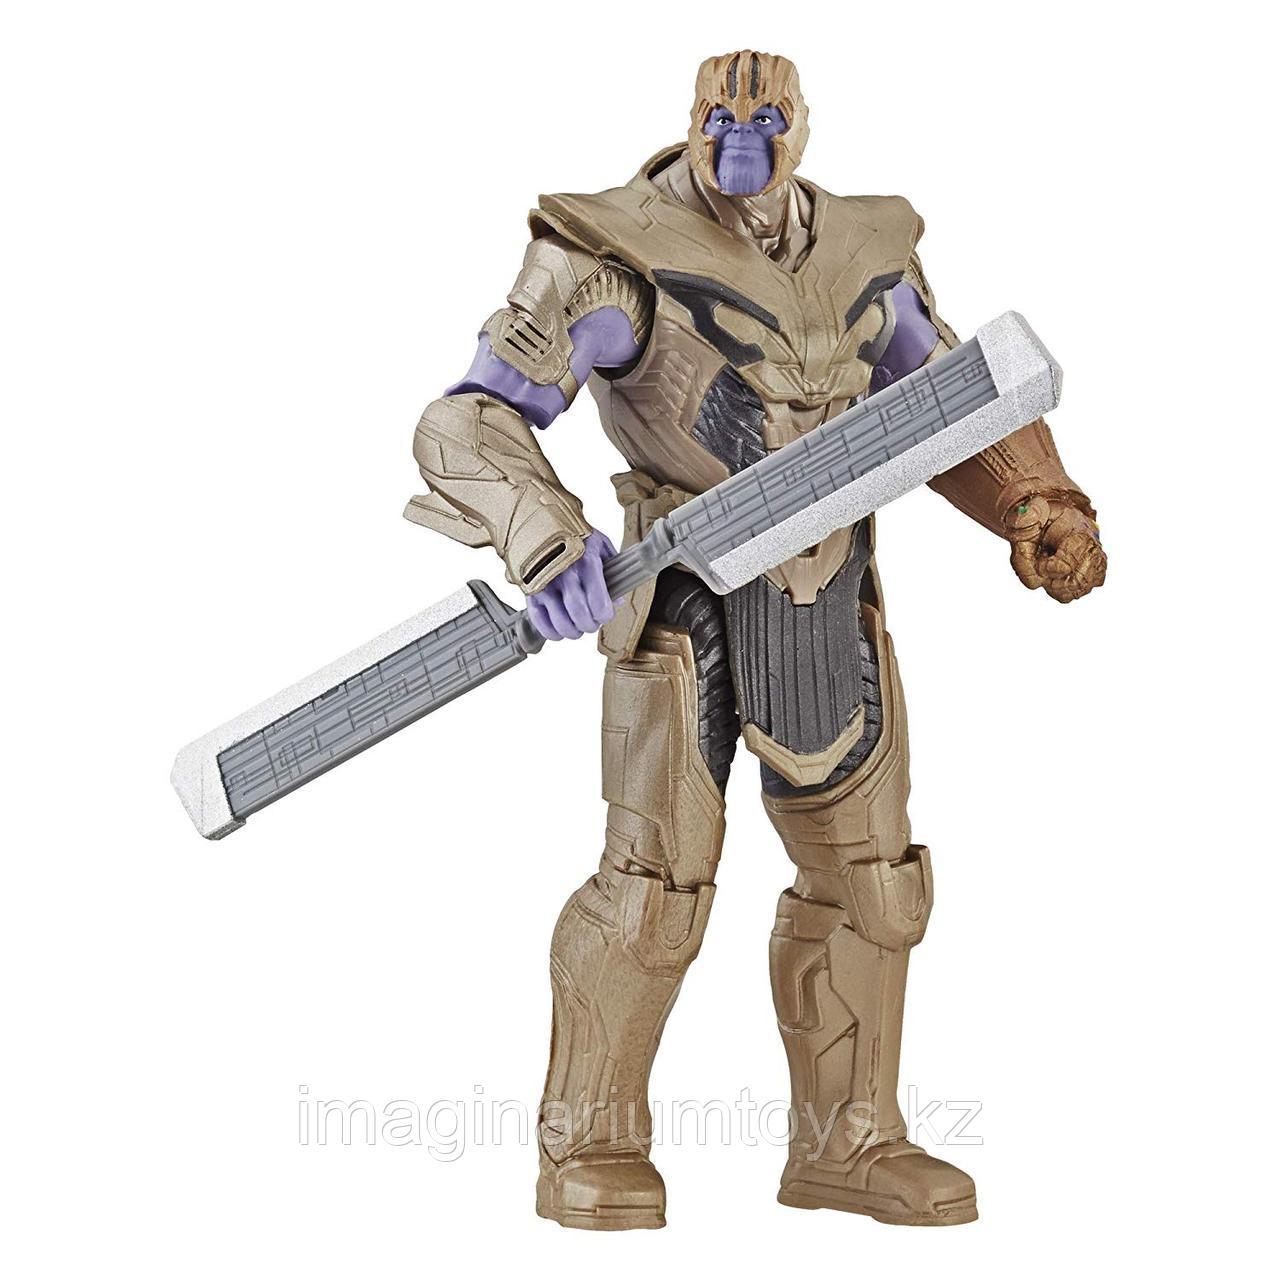 Танос фигурка из к/ф «Мстители. Финал» 15 см Hasbro